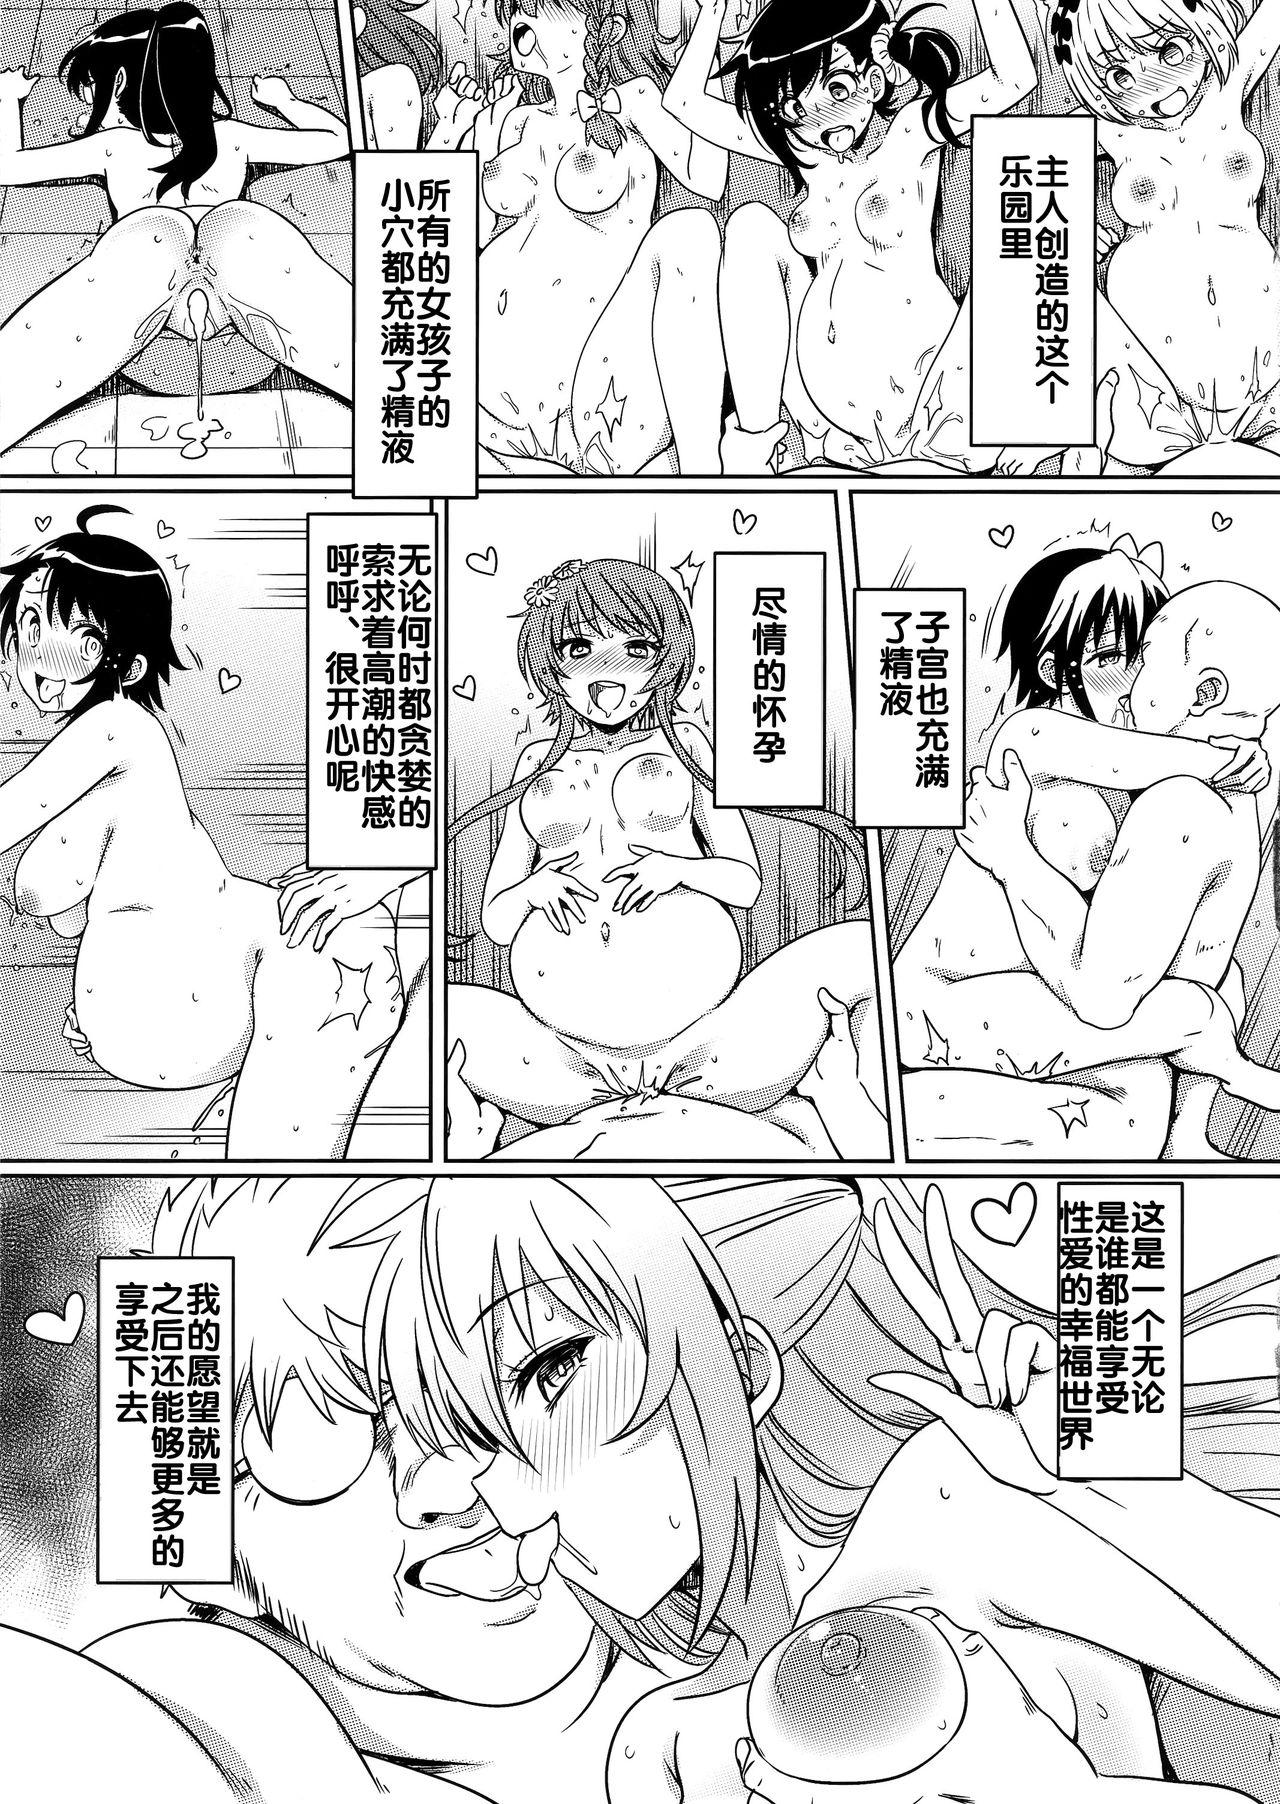 (C96) [Kaminari-neko (Eitarou)] Yamikoi -Saimin- 4   闇恋 -催眠- 4 (Nisekoi) [Chinese] [后悔的神官个人汉化] 24